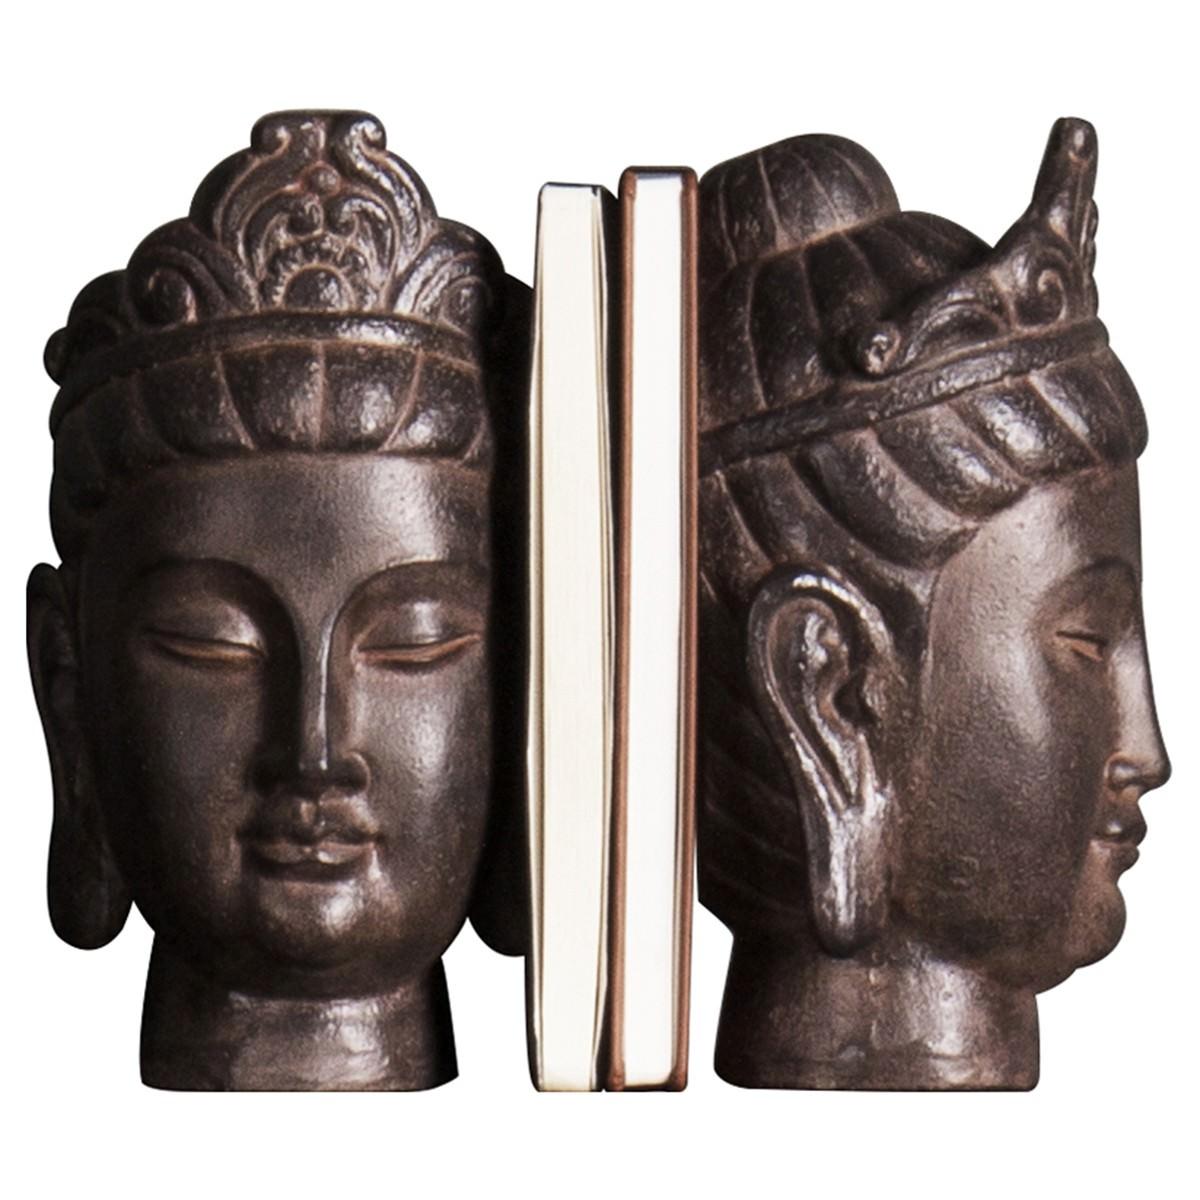 Saffron Buddha Head Bookend Set